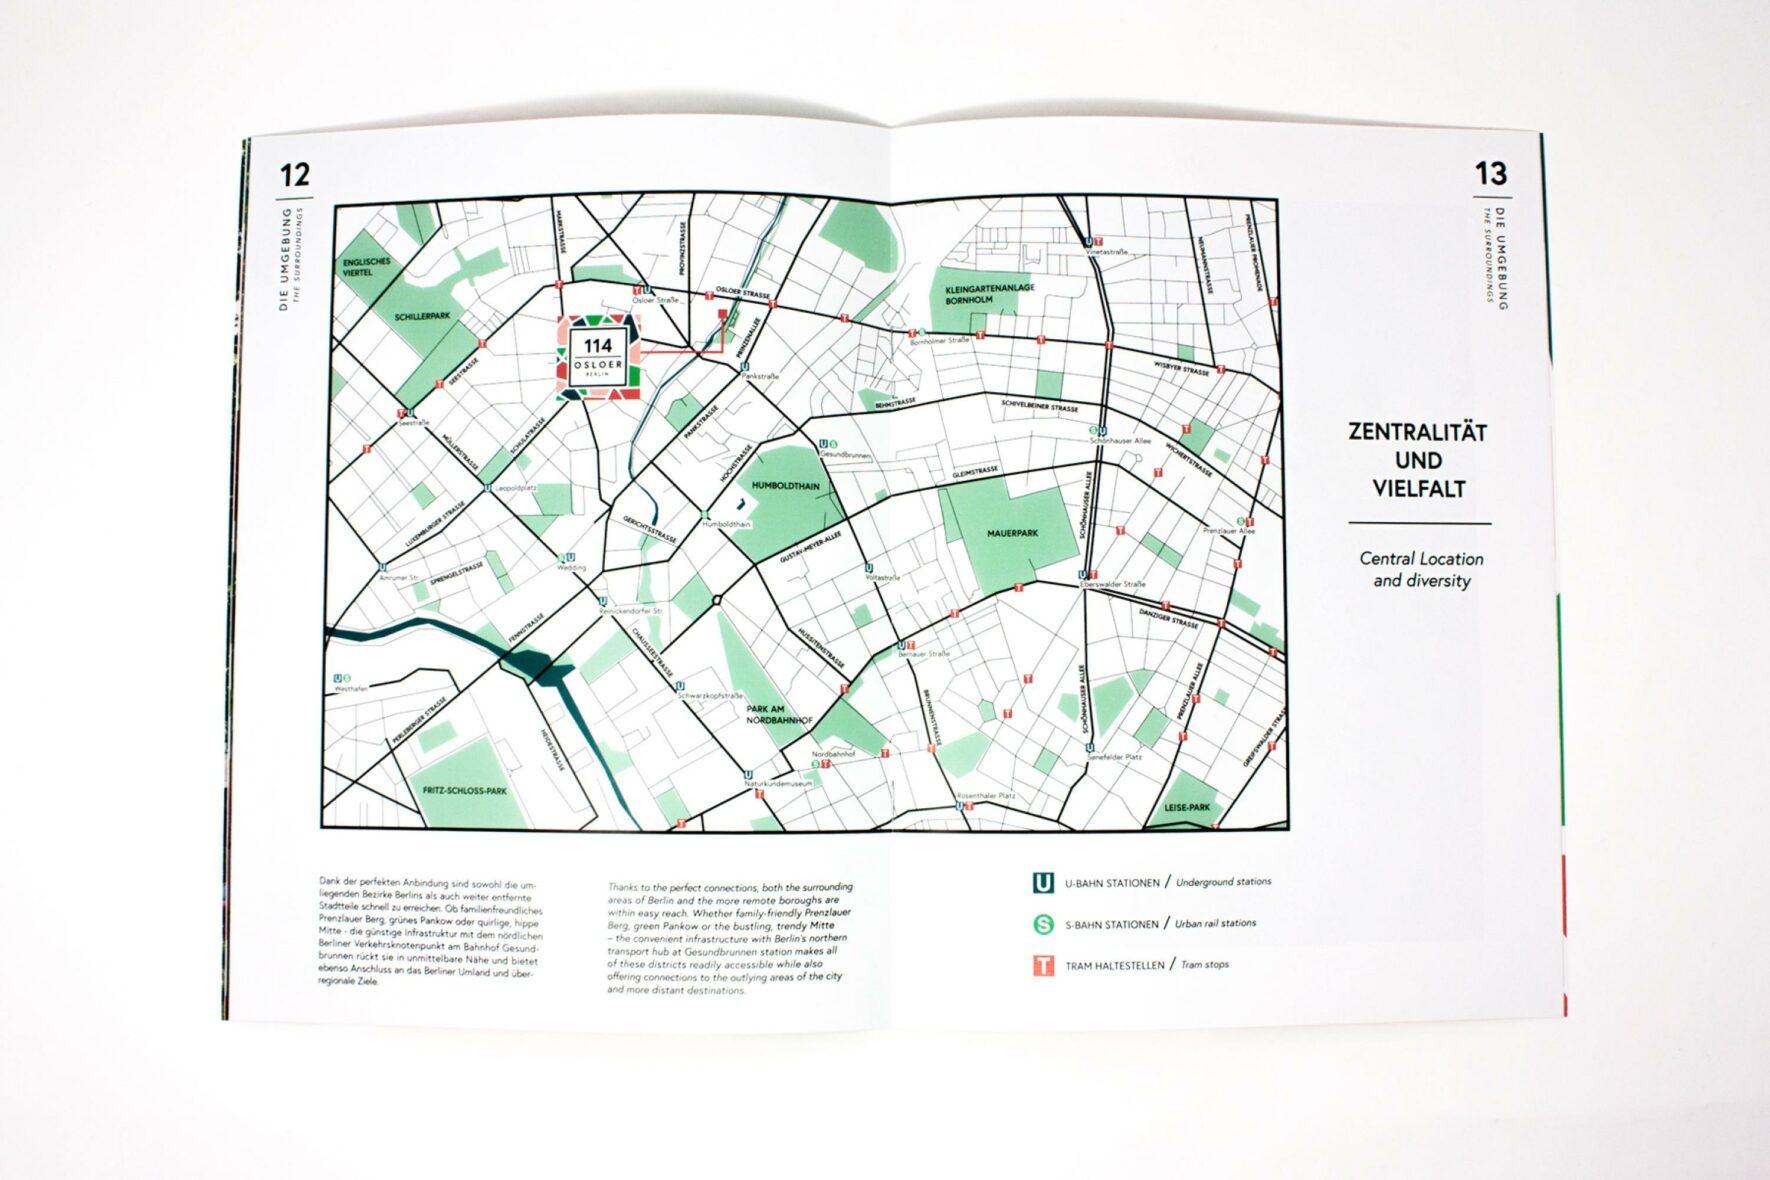 Broschuere-Osloer-Immobilienbranding-Trendcity-FORMLOS-berlin-07